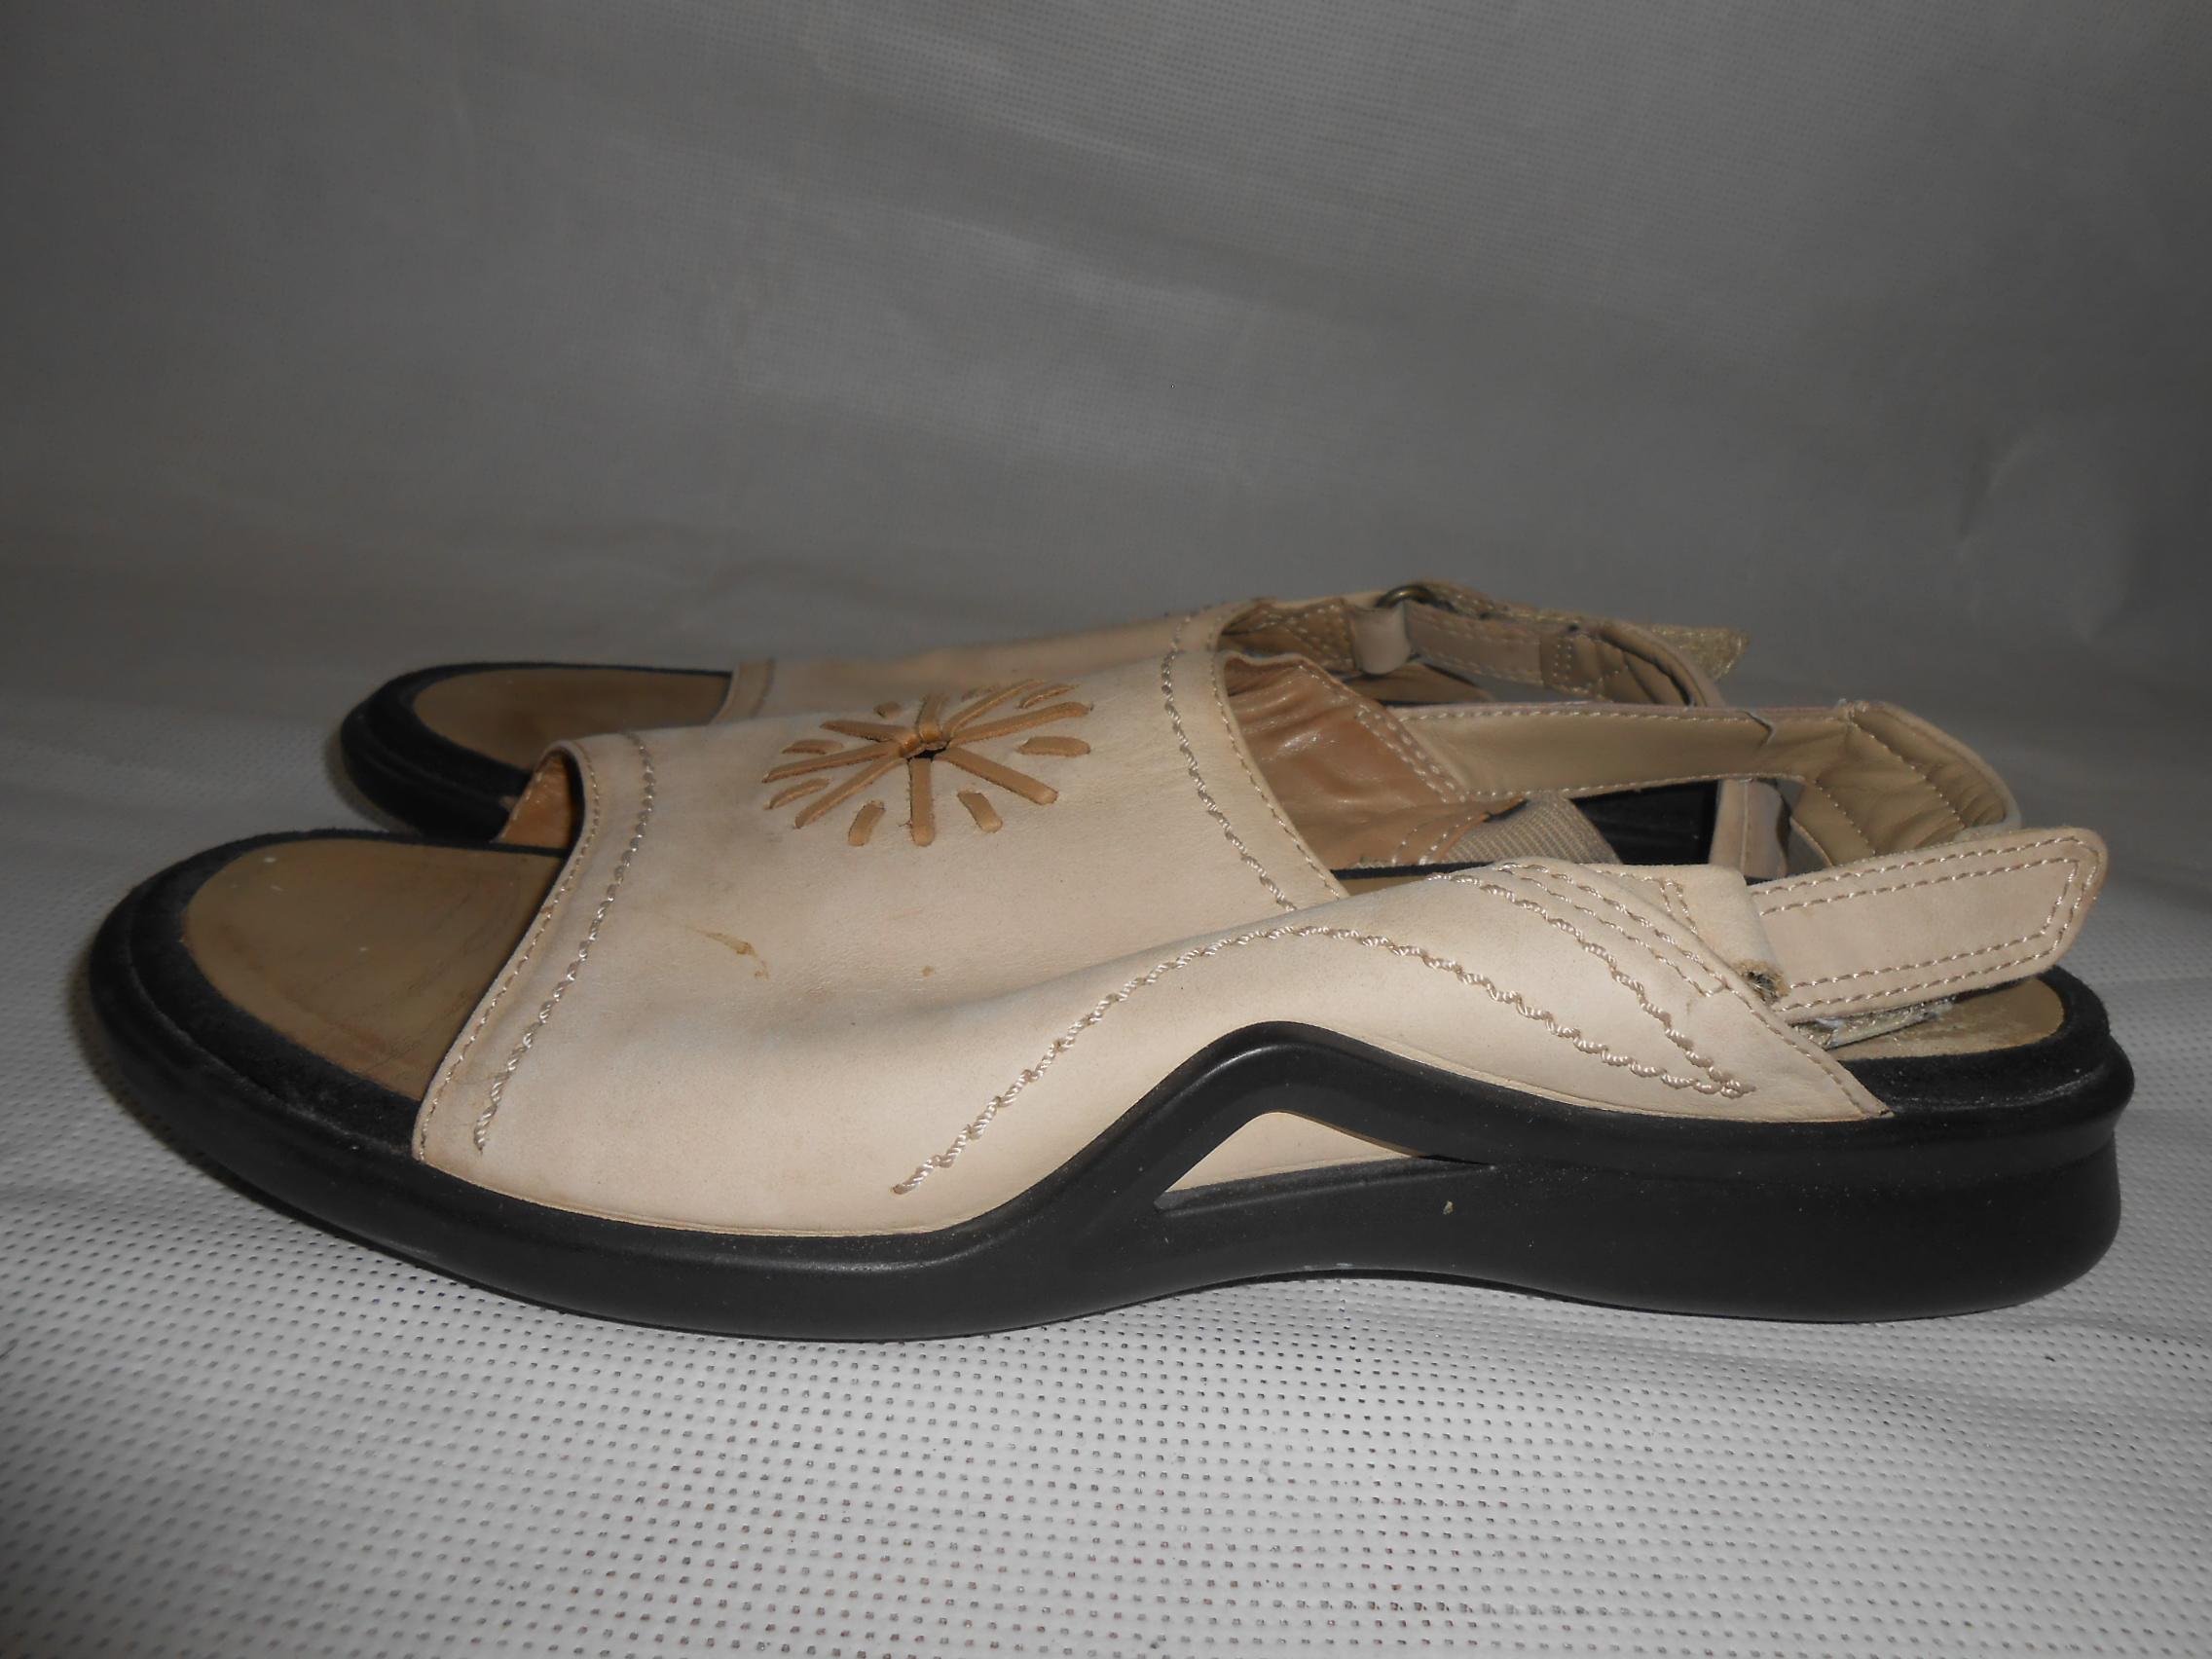 d8df15b8 ECCO Super buty damskie z Anglii !!nr 38 - 7309685544 - oficjalne ...